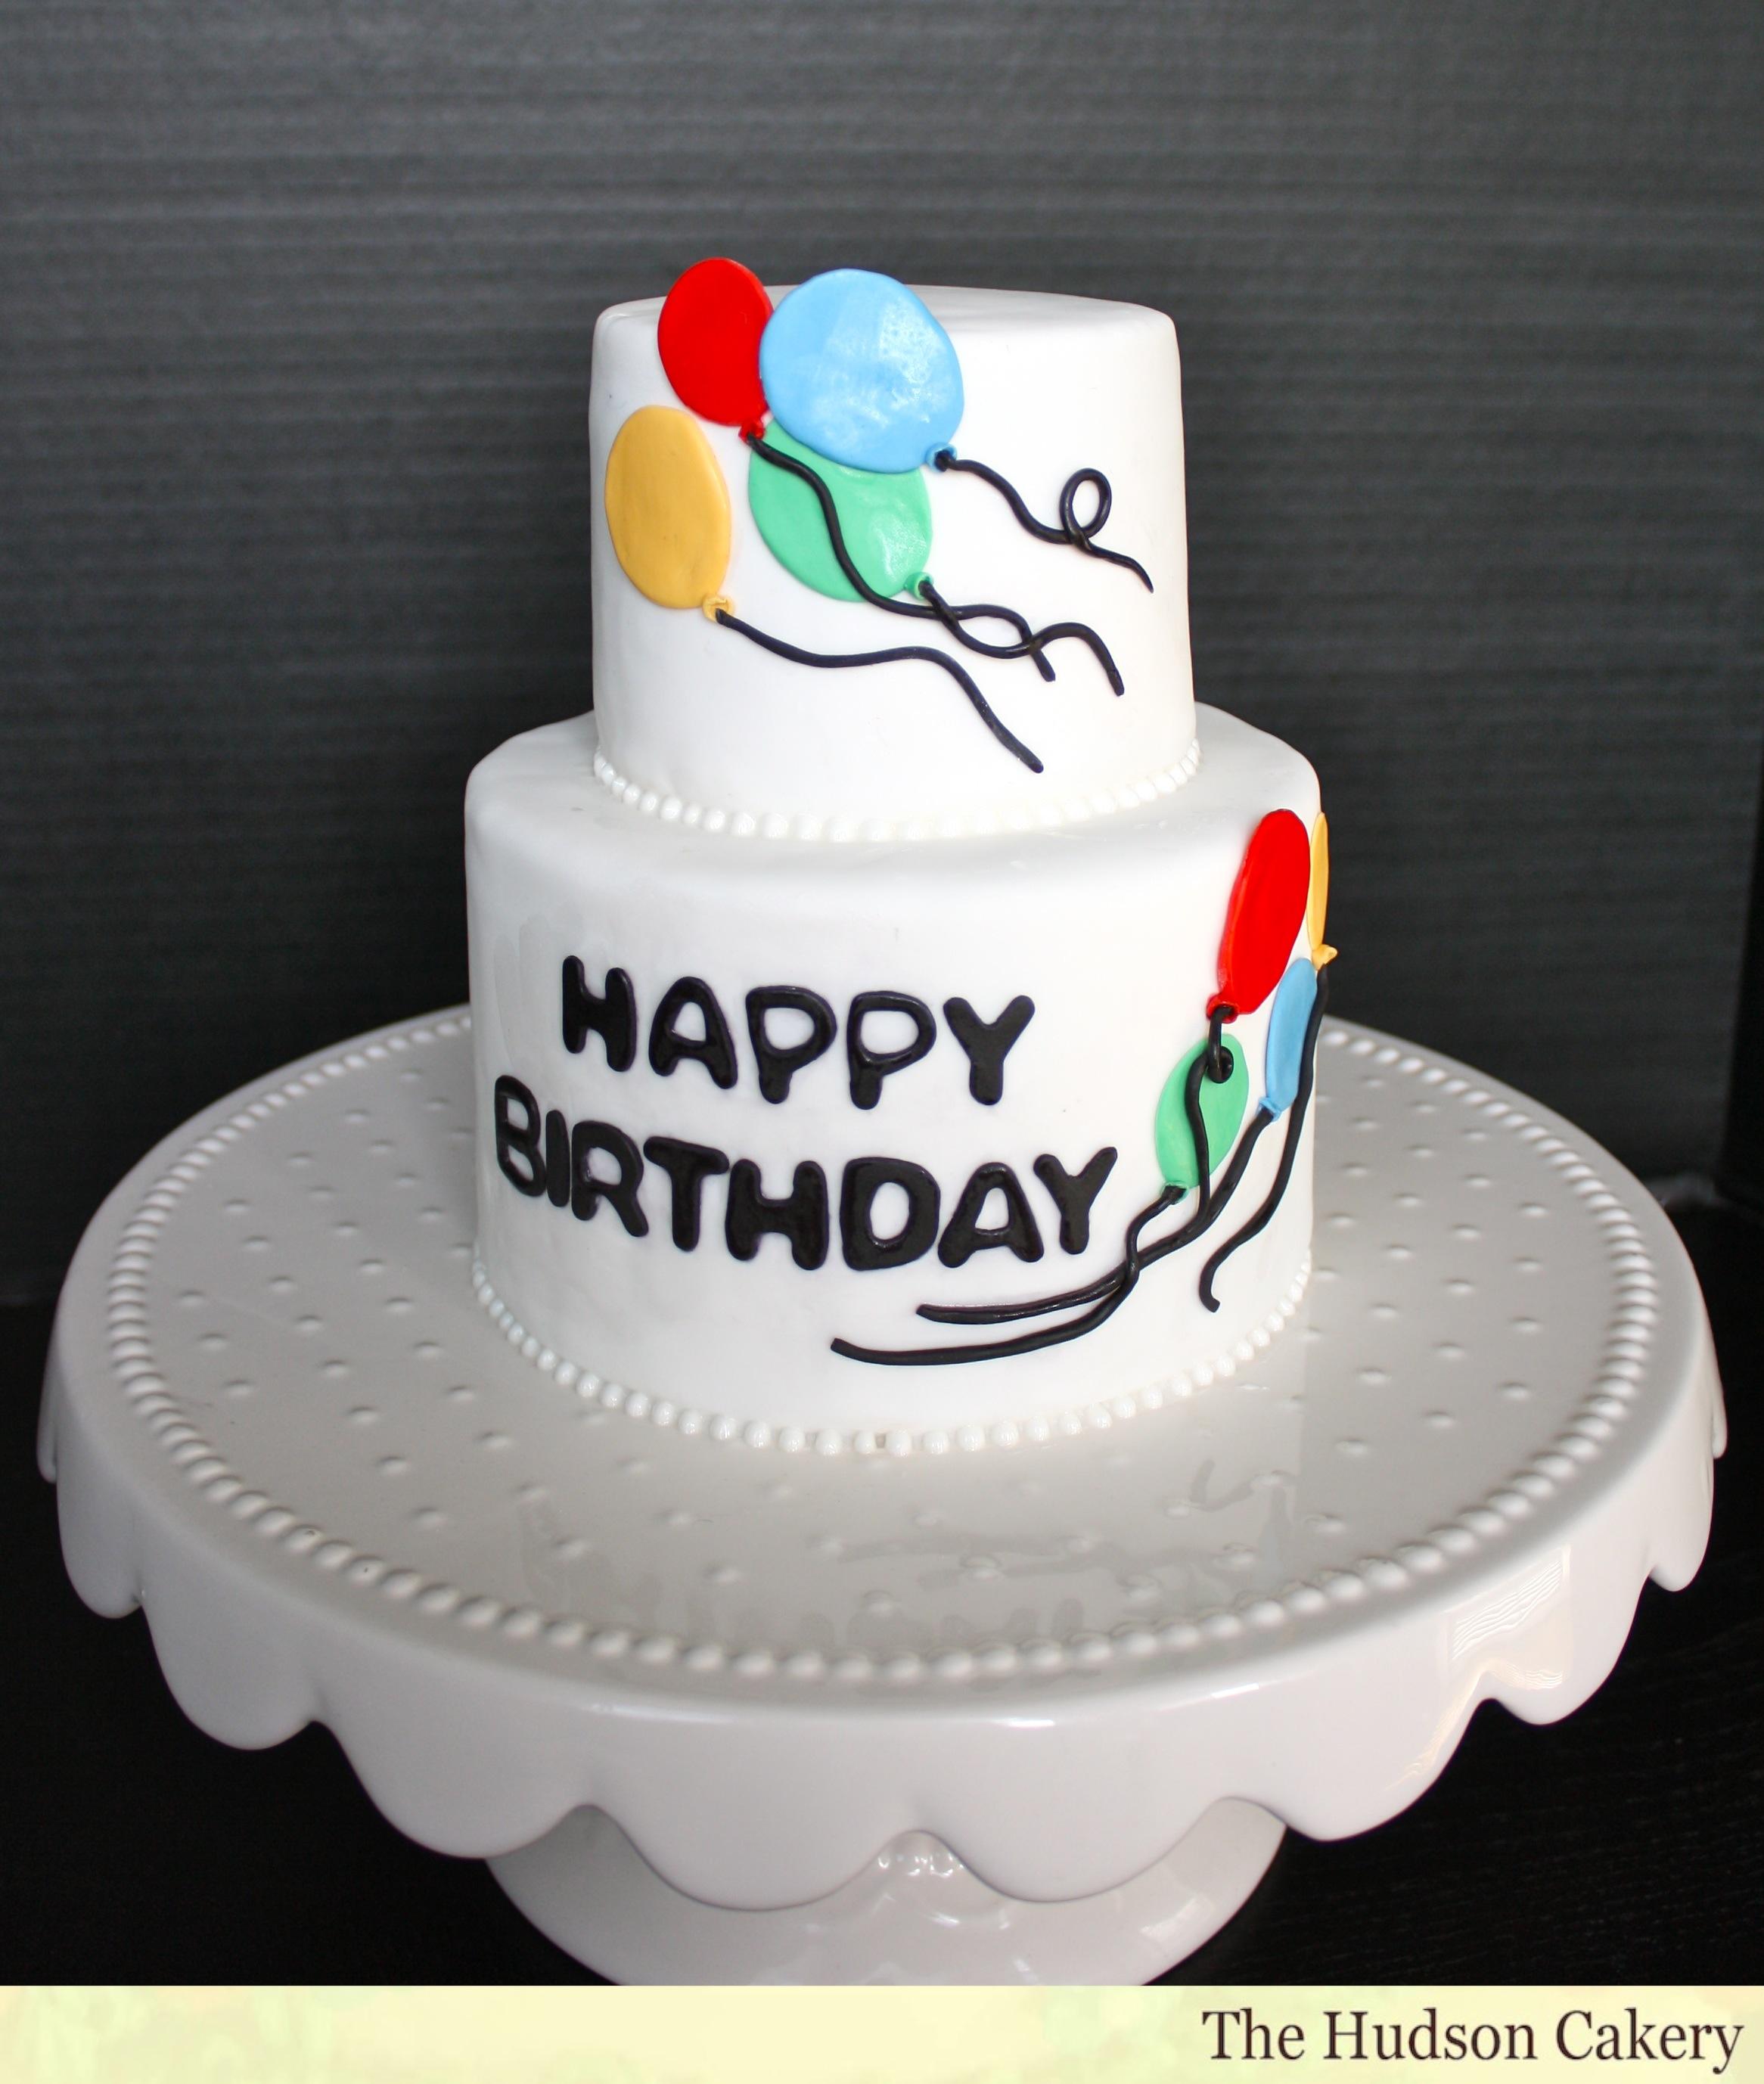 5 Birthday Cakes On It With Balloons Photo Balloon Birthday Cake